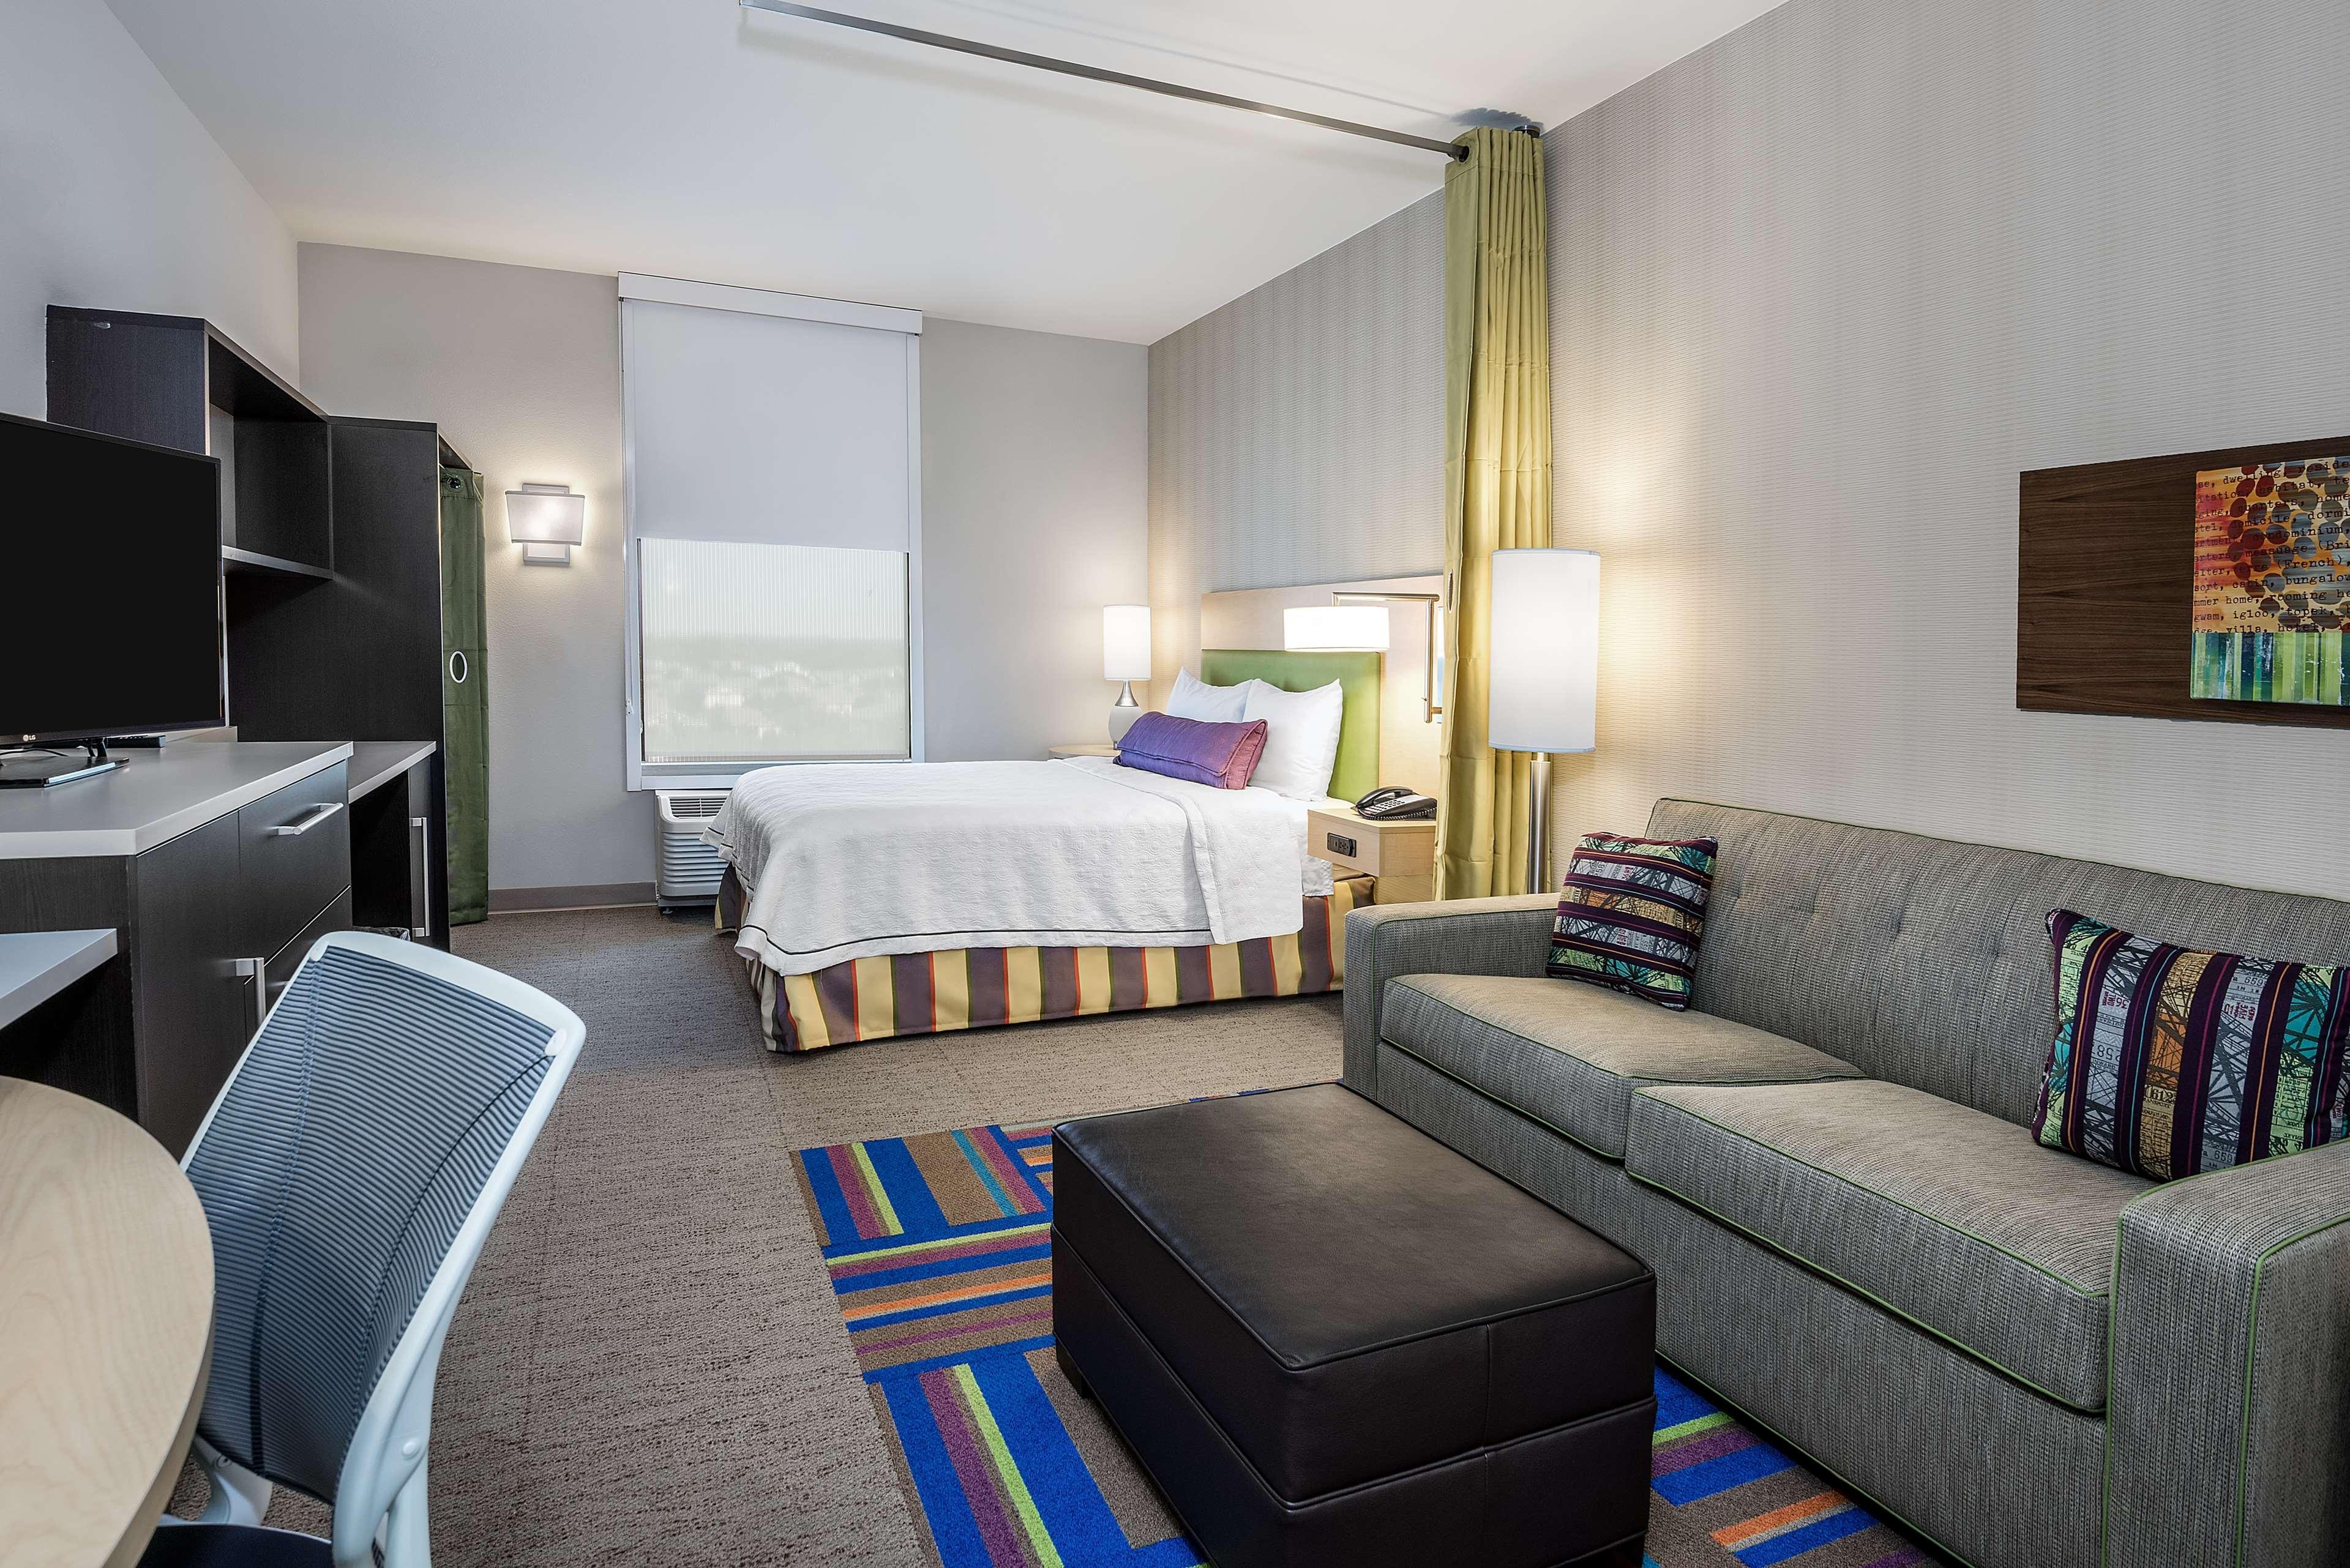 Home2 Suites by Hilton Austin Airport image 27